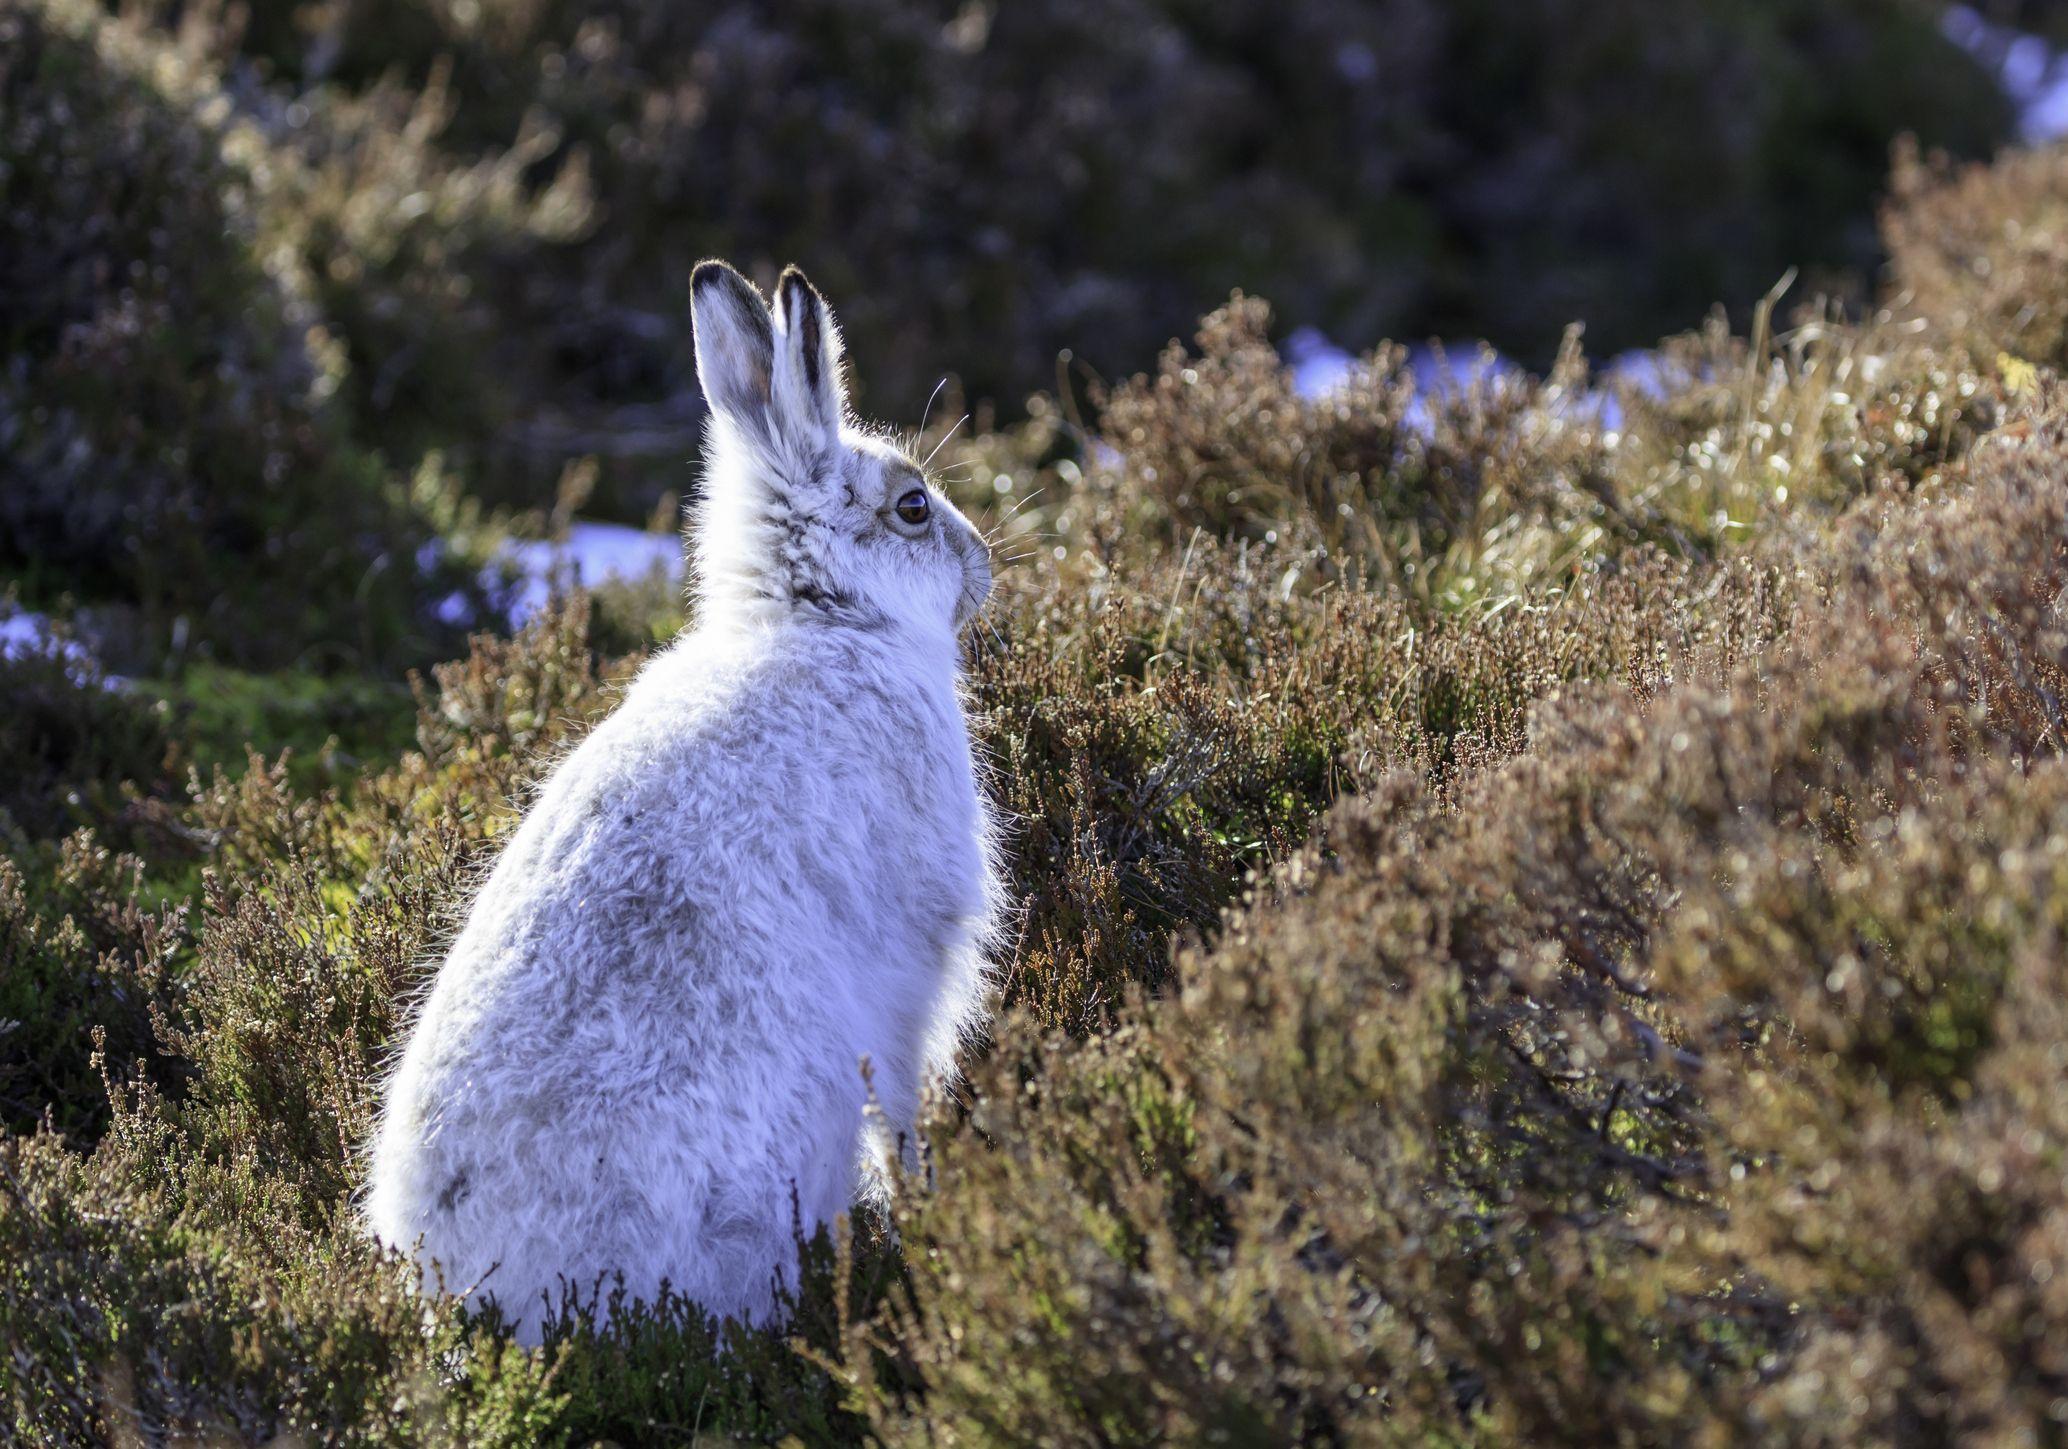 White mountain hare